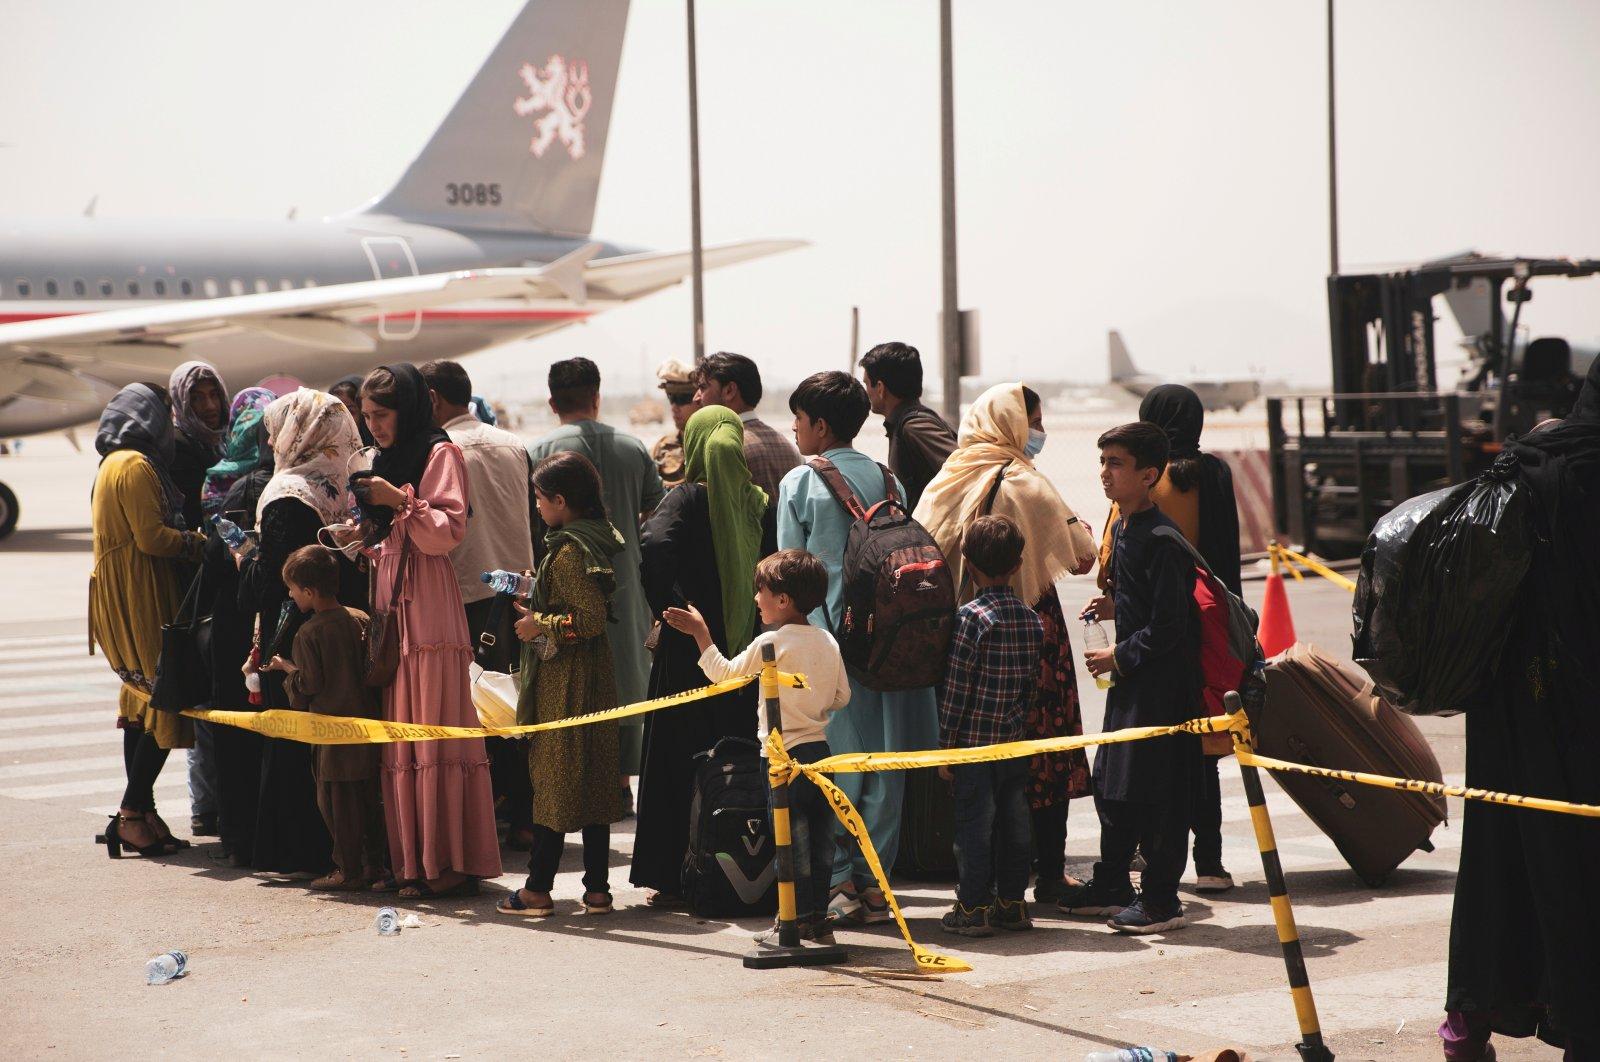 Civilians prepare to board a plane during an evacuation at Hamid Karzai International Airport, Kabul, Afghanistan, Aug. 18, 2021. (Reuters Photo)